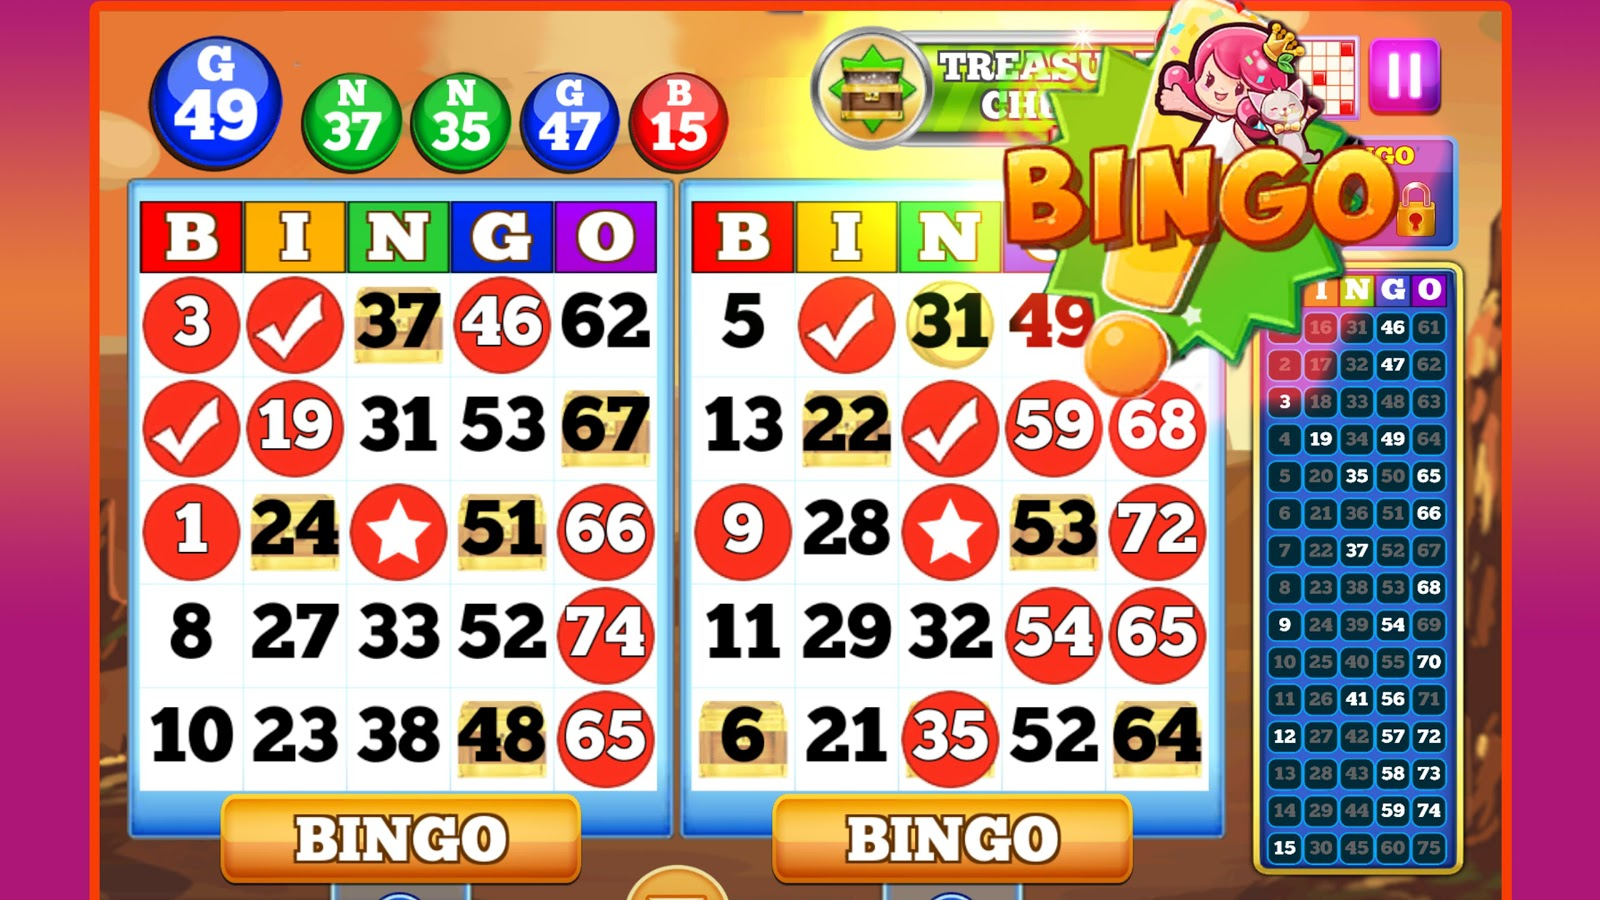 Bingo online gratis aprenda a jugar póquer 973196